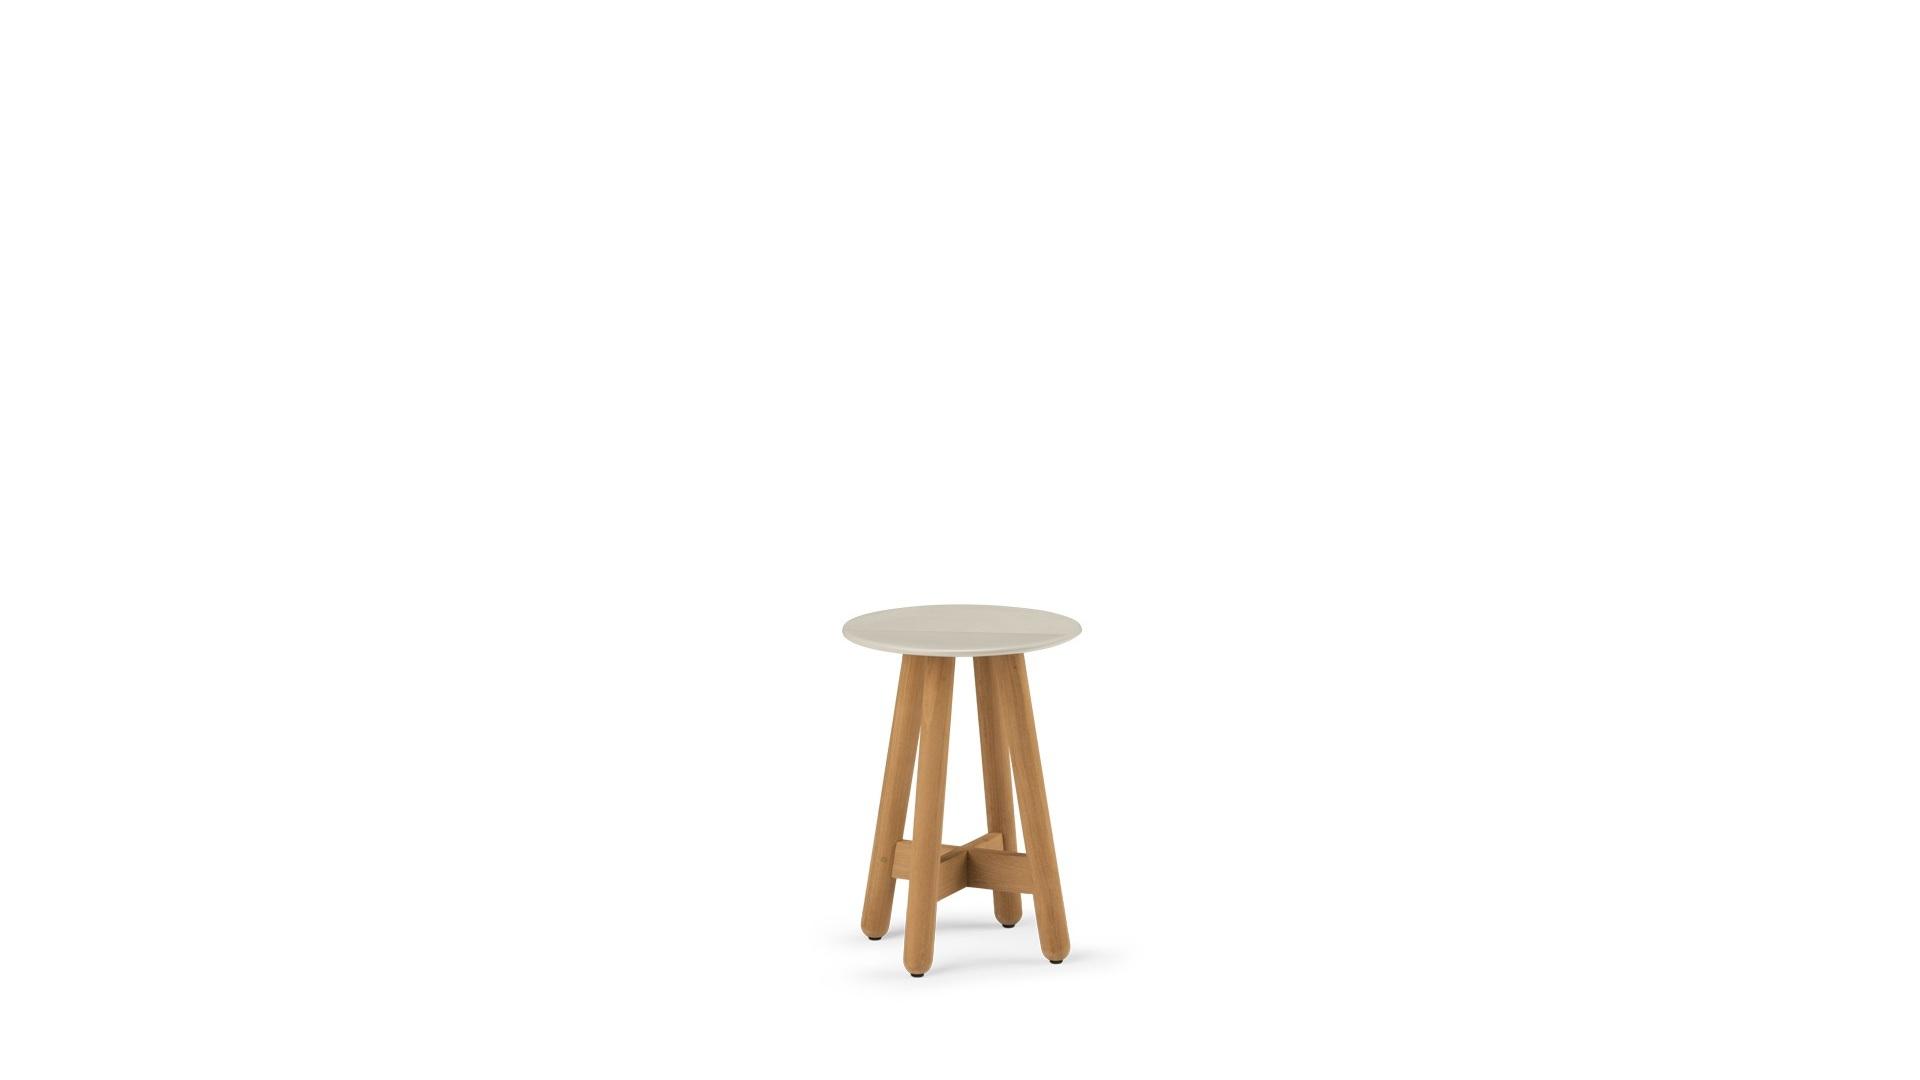 DEDON-Mbrace-Side_table_small_chalkH.jpg